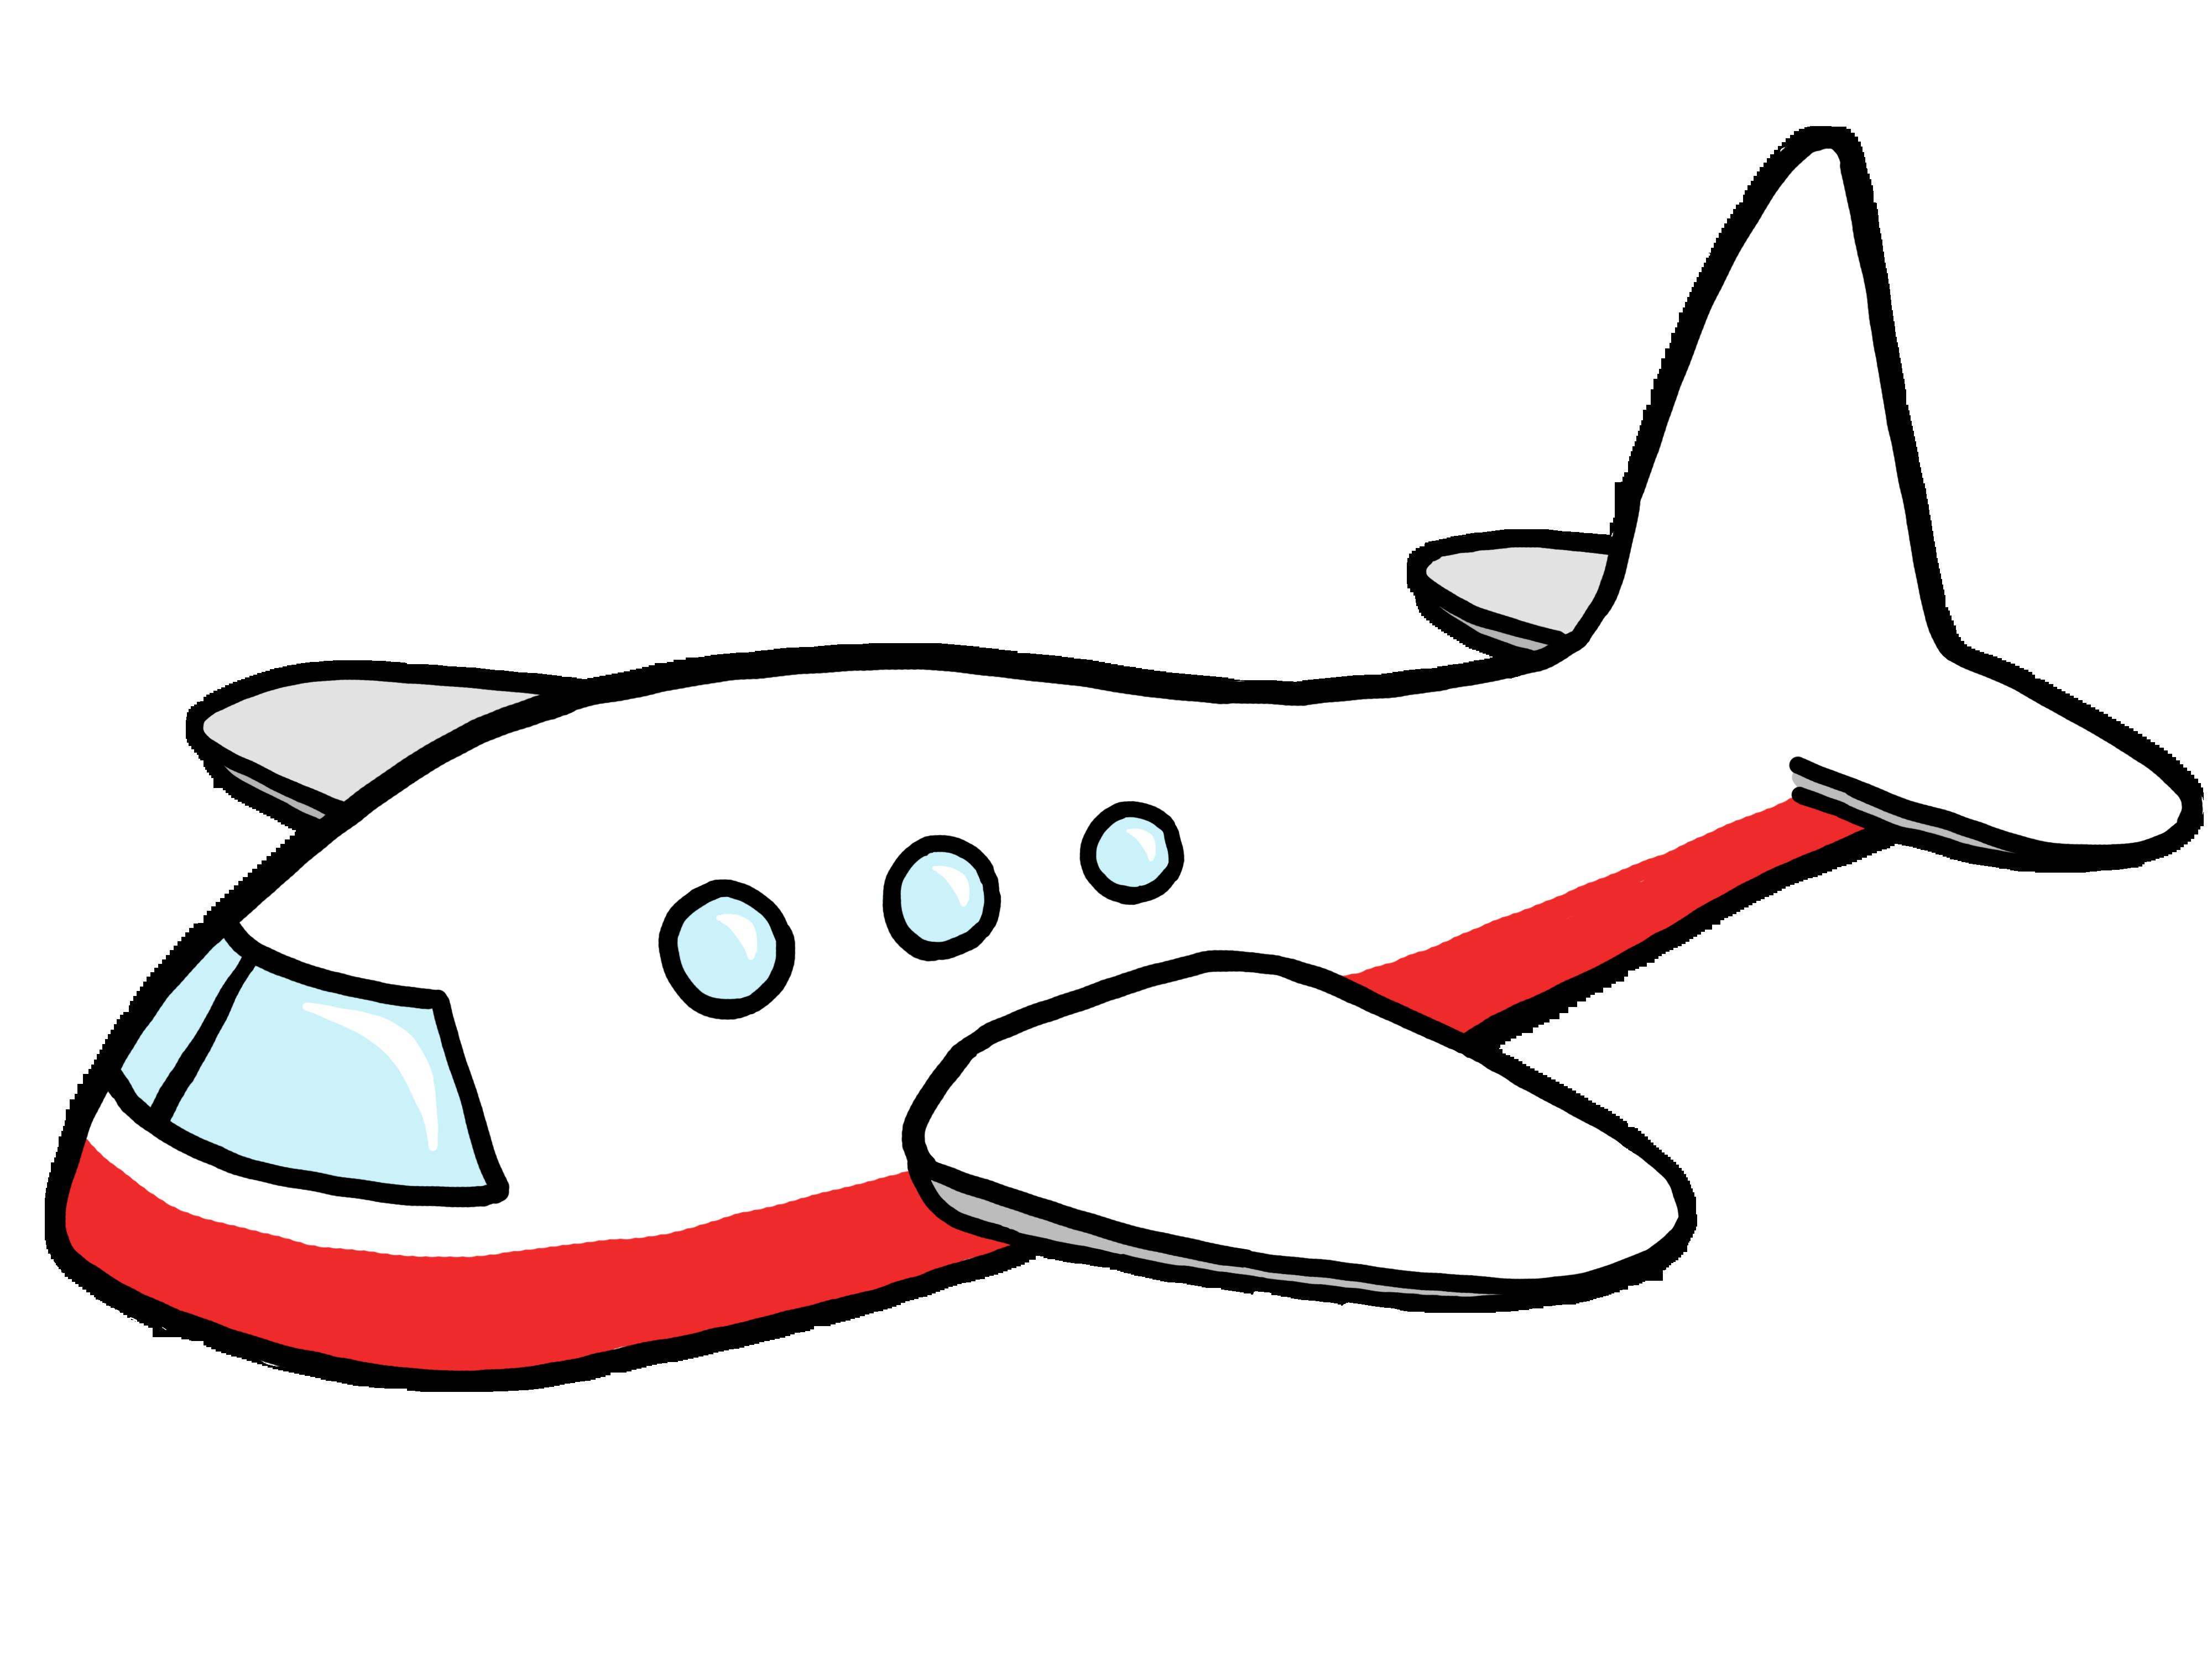 4000x3000 Cartoon Transport Plane Png Clipart